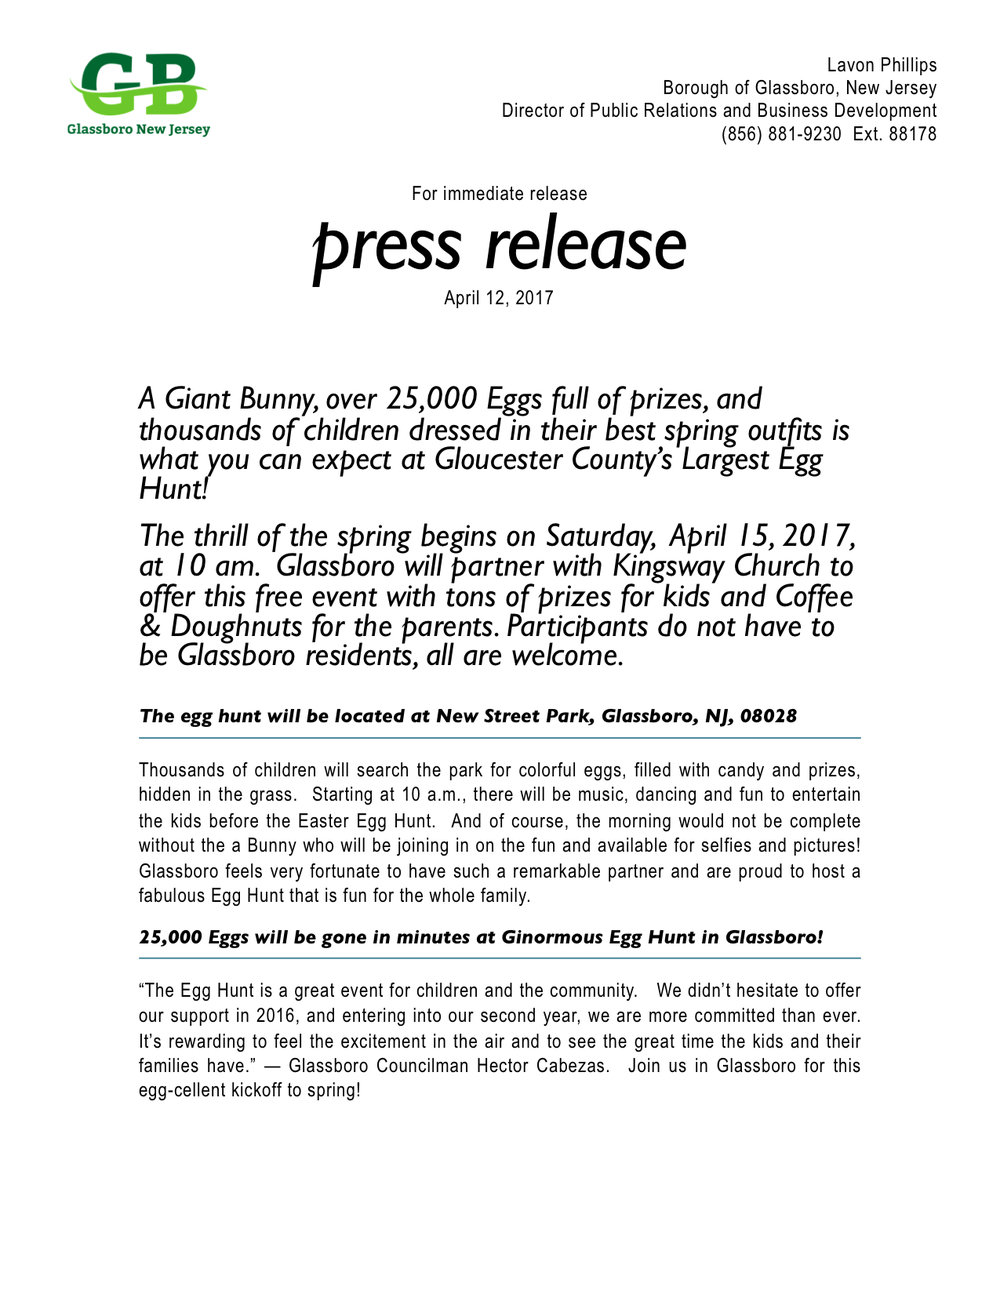 Glassboro NJ Press Release 2017 Gloucester County's Largest Egg Hunt